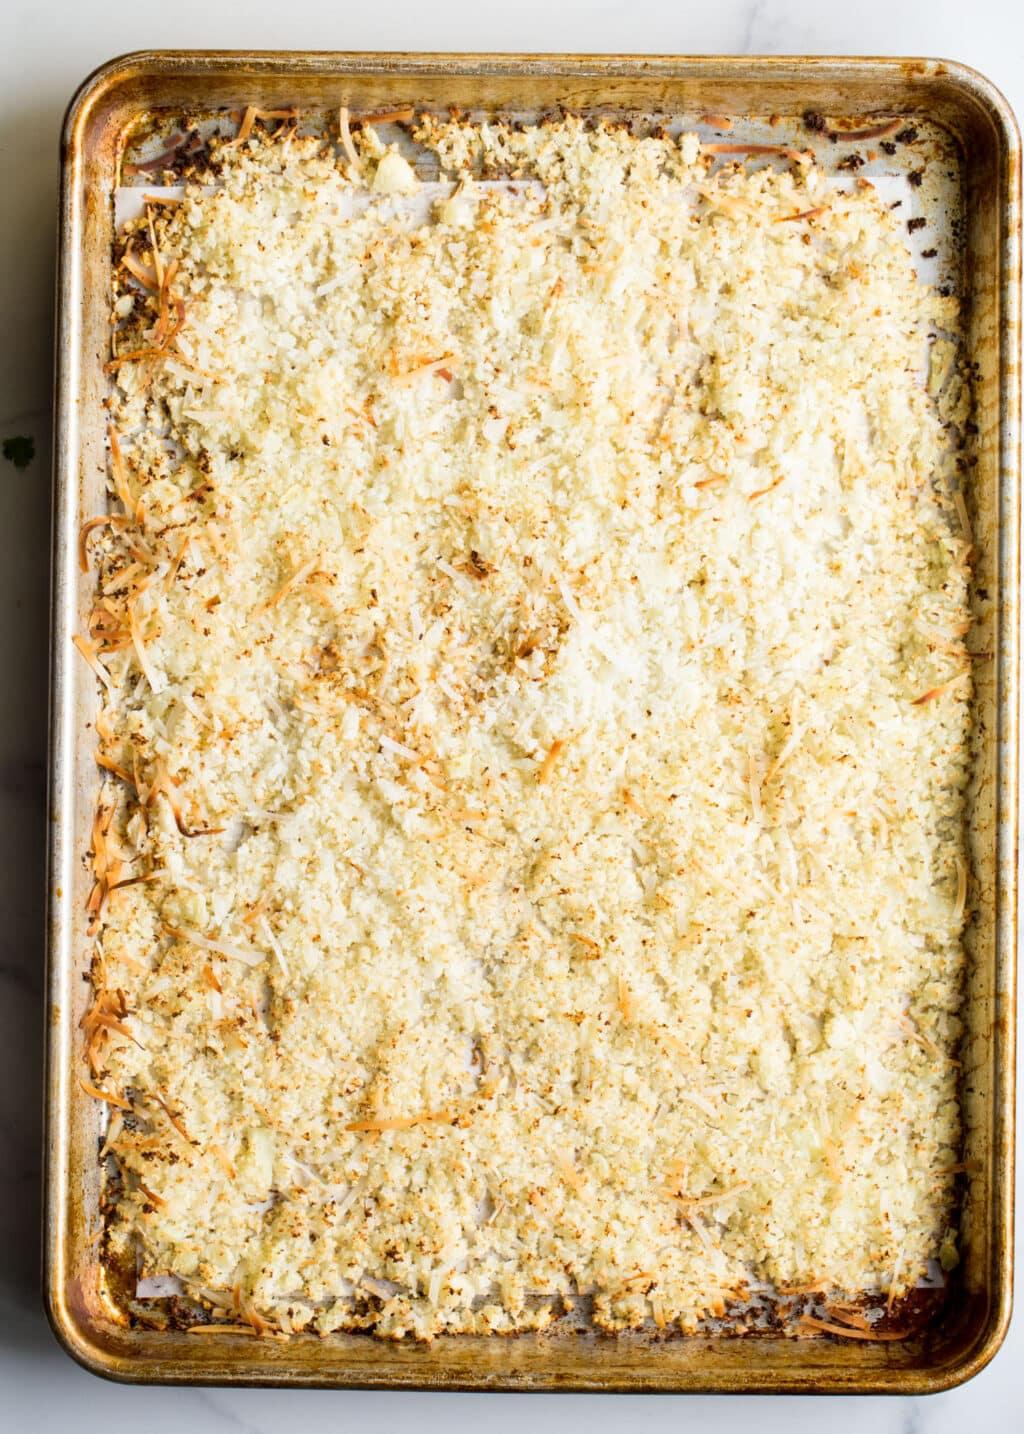 Sheet pan with roasted cauliflower rice